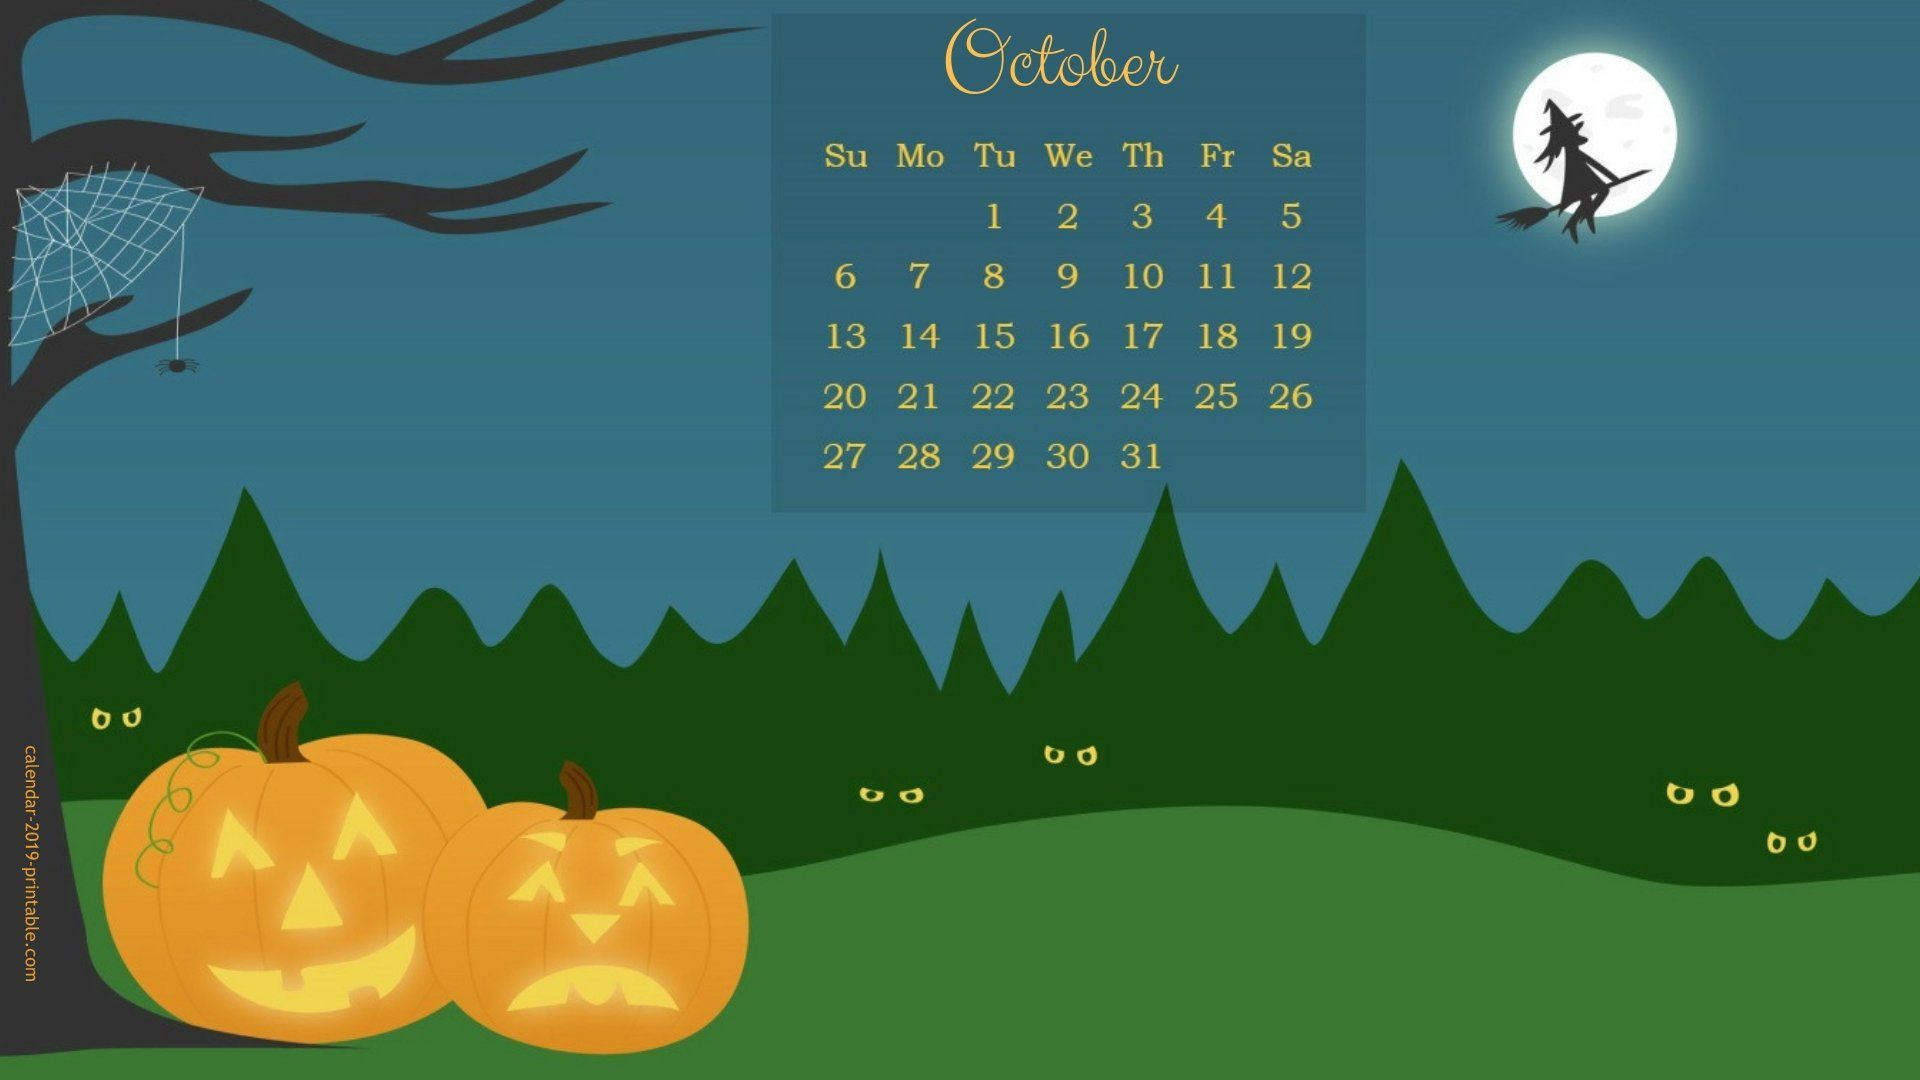 October 2019 Calendar Halloween Wallpaper